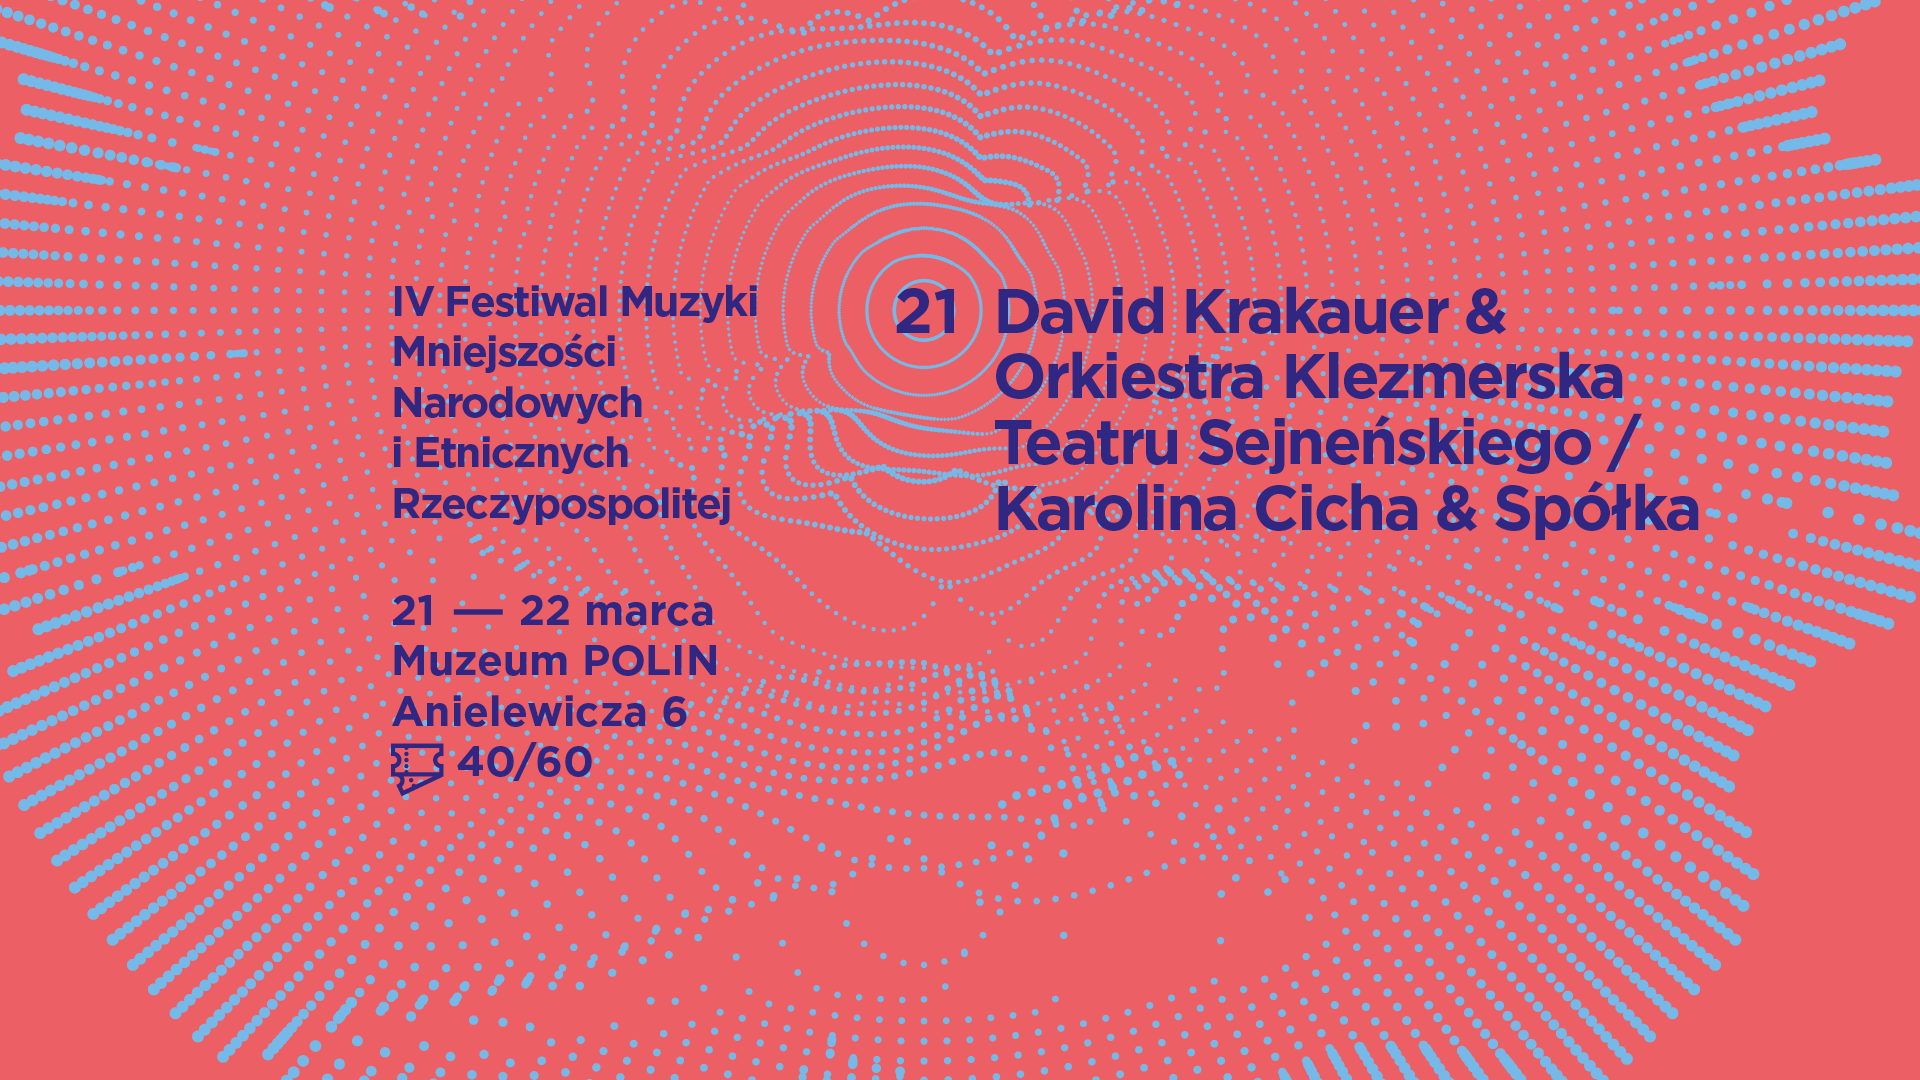 https://polin.pl/sites/default/files/2020-03/festiwal-final_krakauer-cicha_1.png